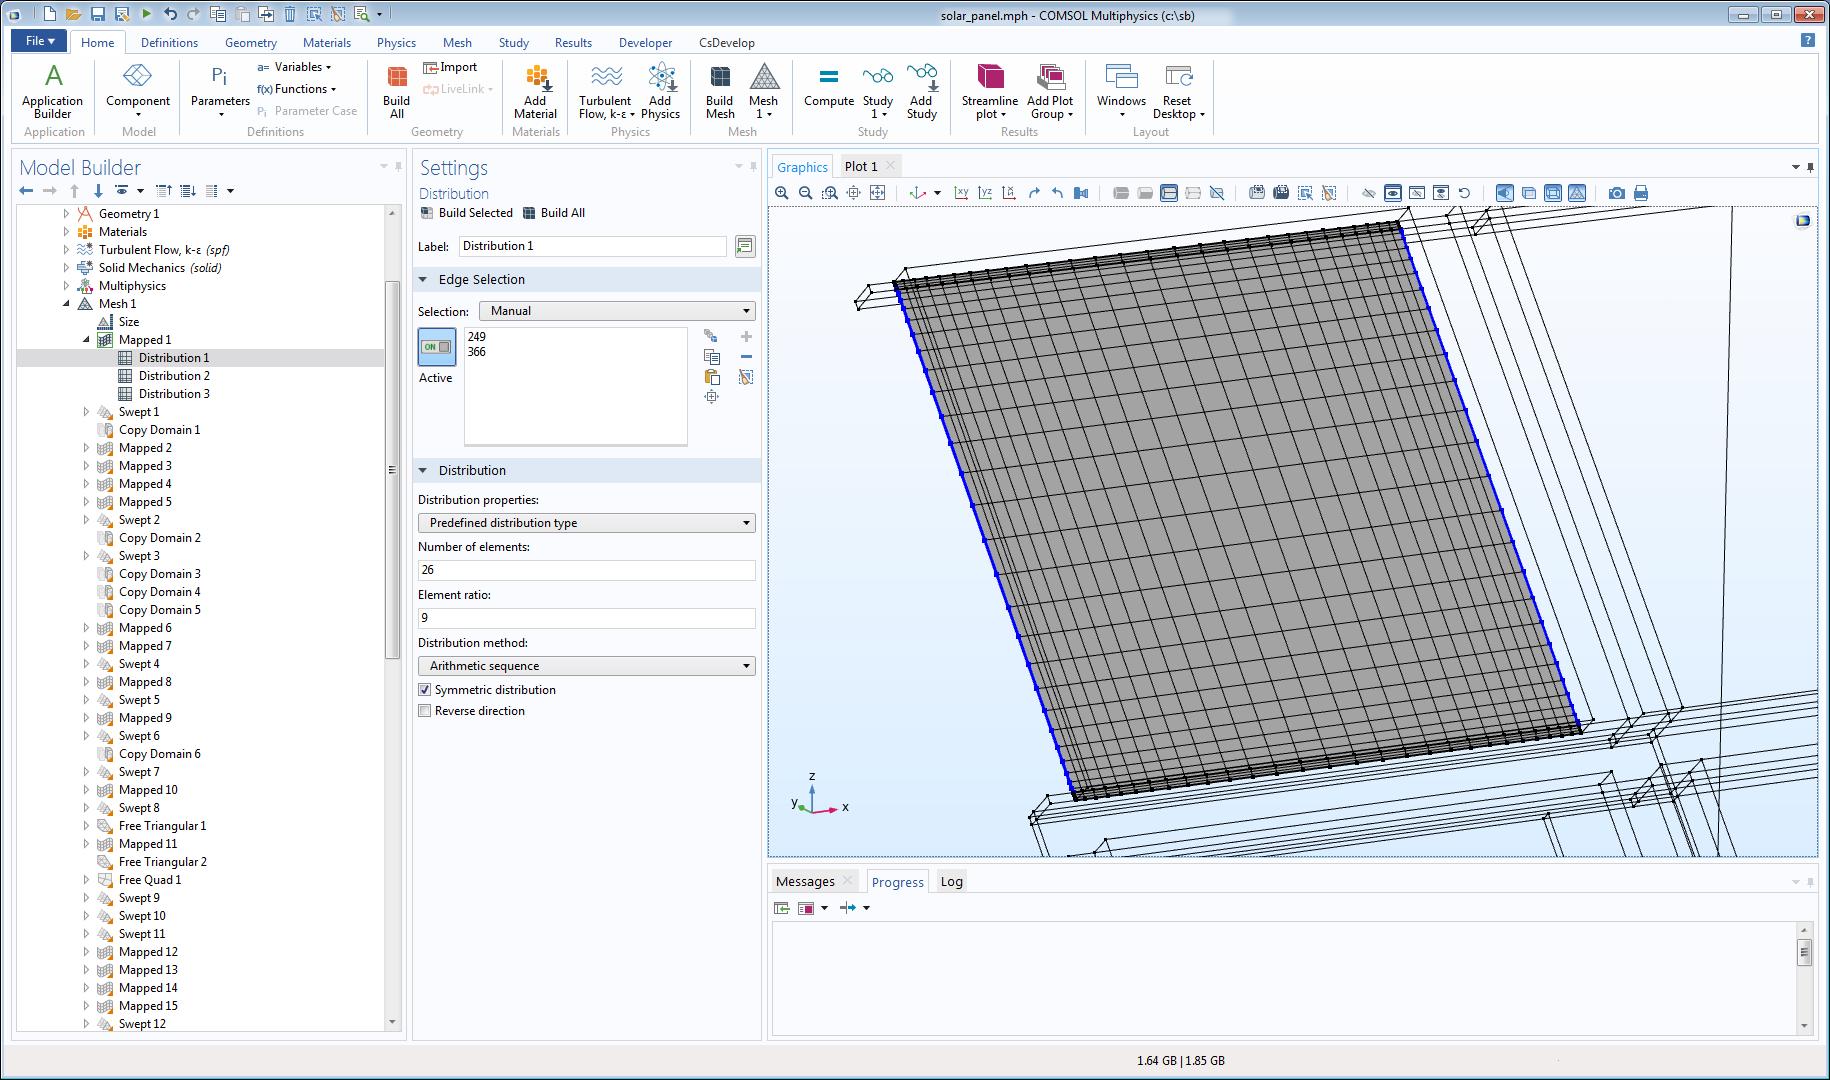 COMSOL Multiphysics GUI 中显示的包含映射网格的太阳能电池板模型。